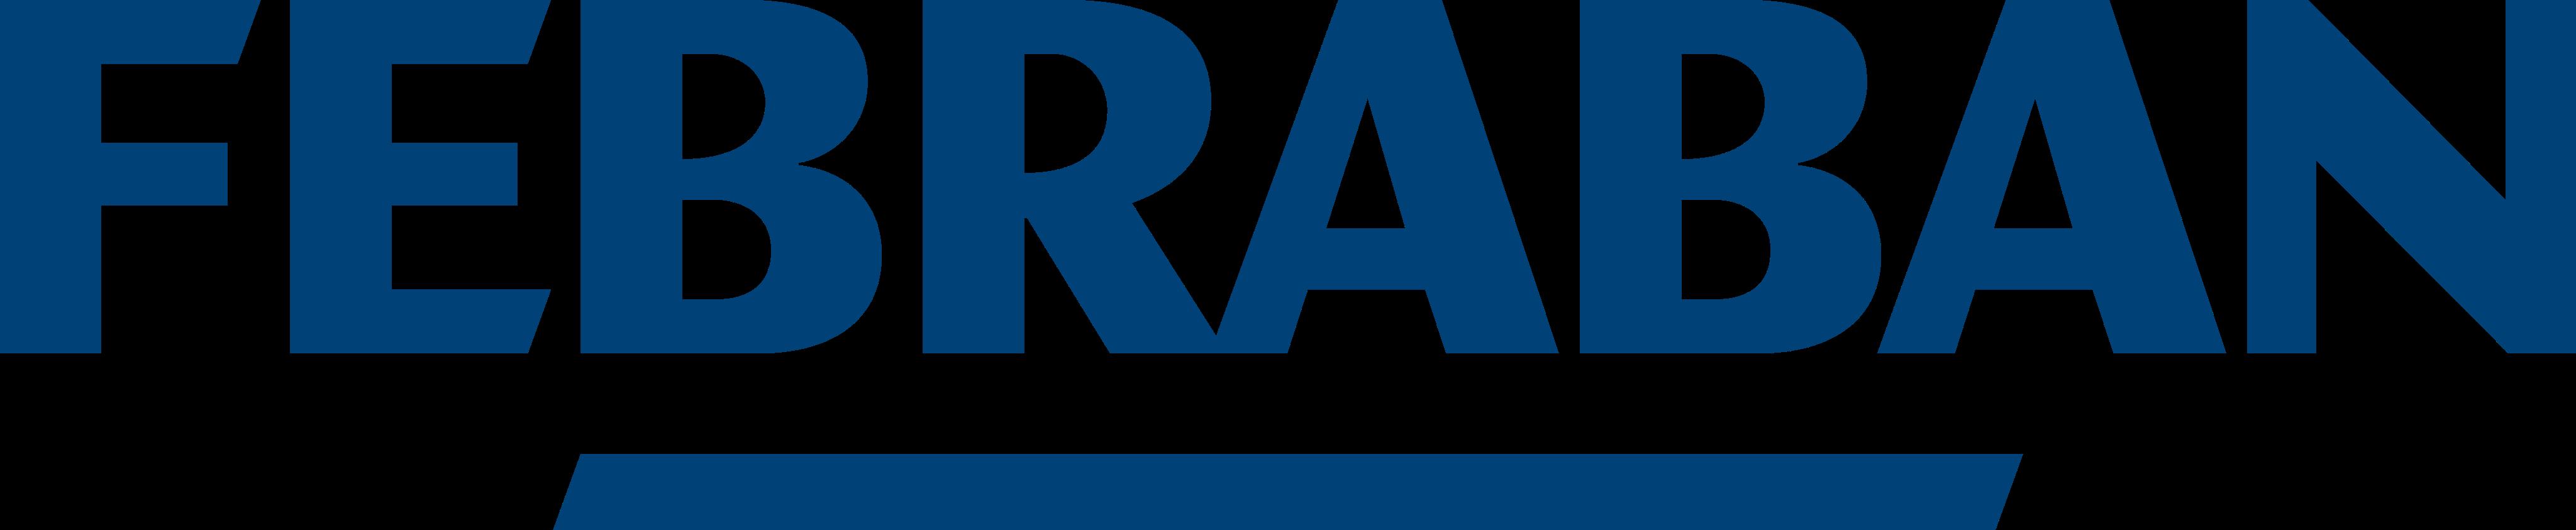 febraban logo 1 - Febraban Logo